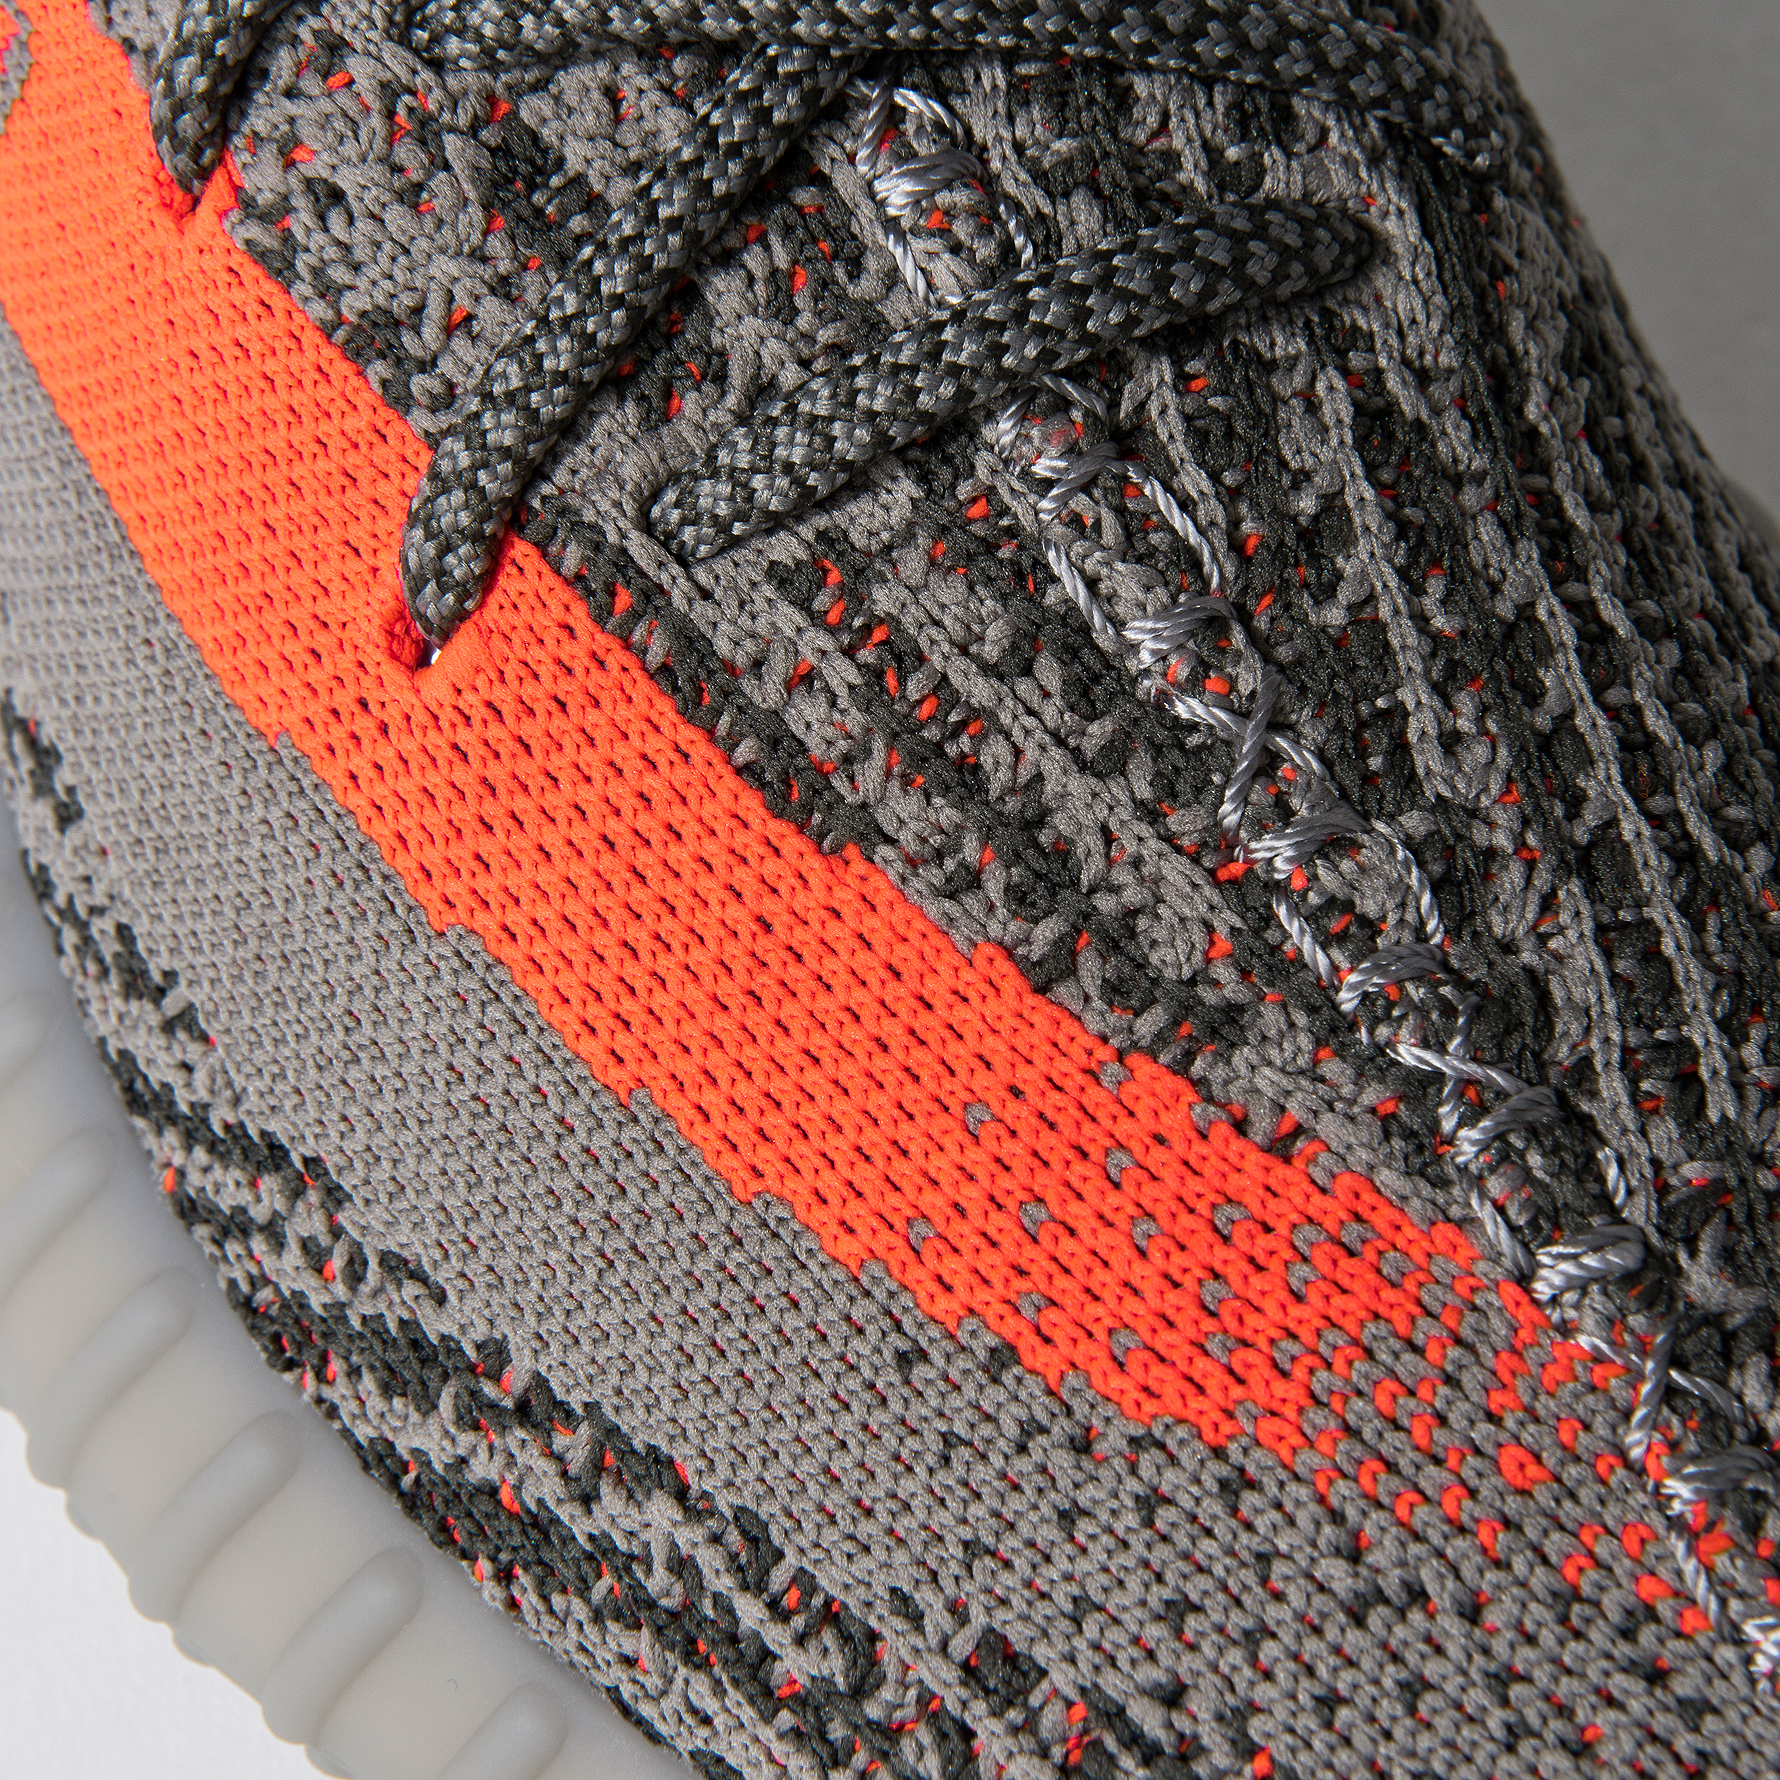 Adidas Yeezy 350 Boost V2 bb1826 Toe